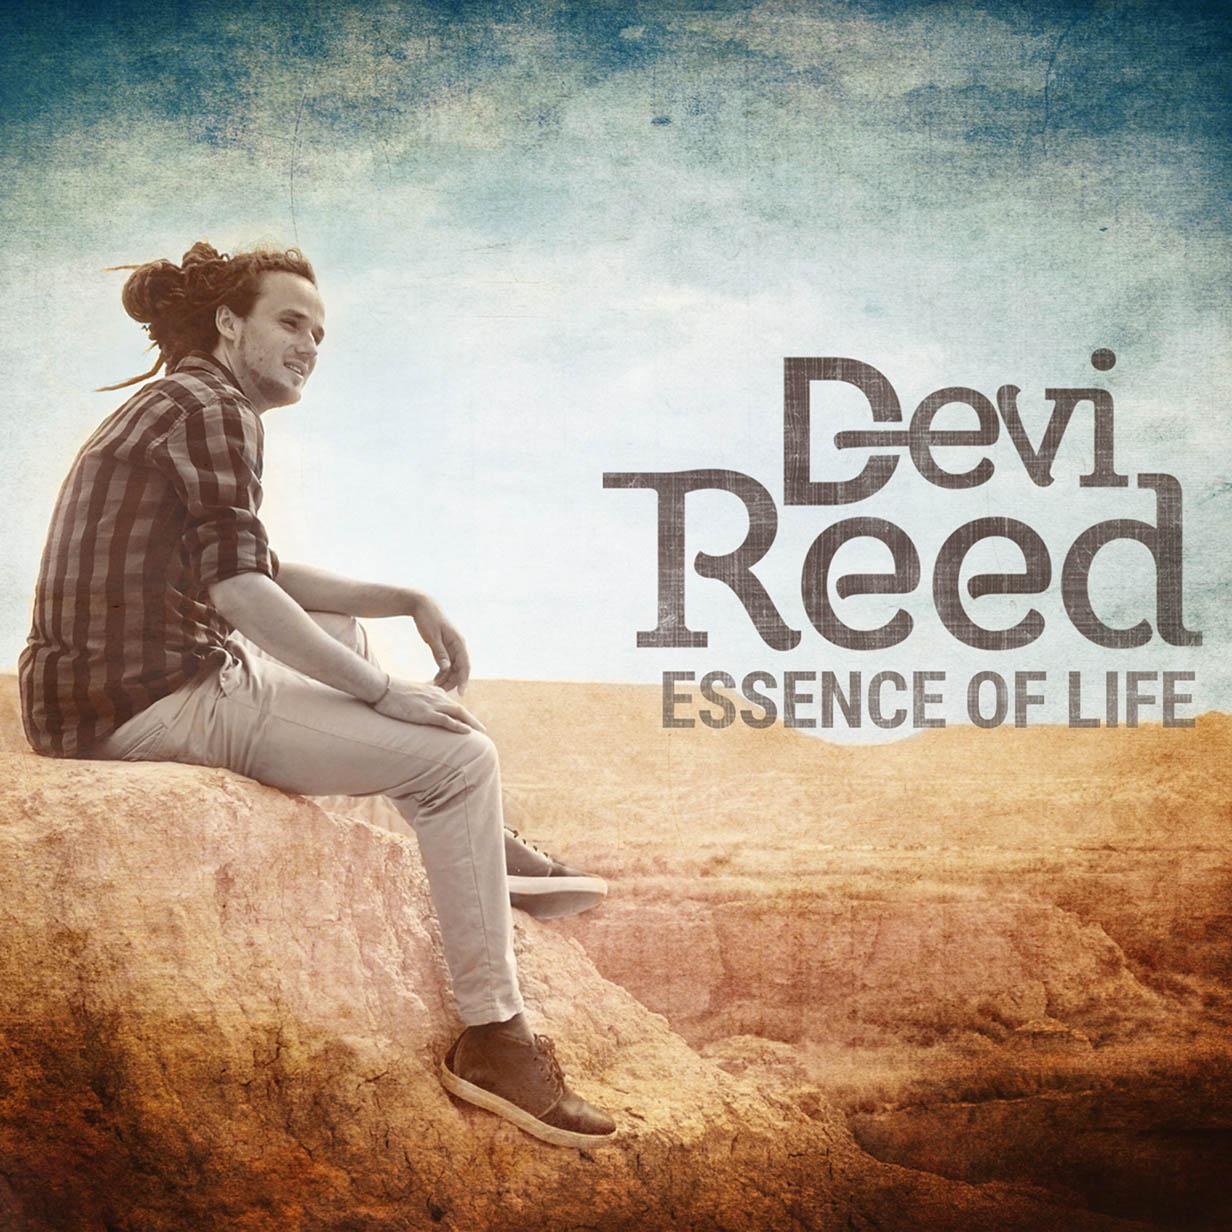 Devi Reed